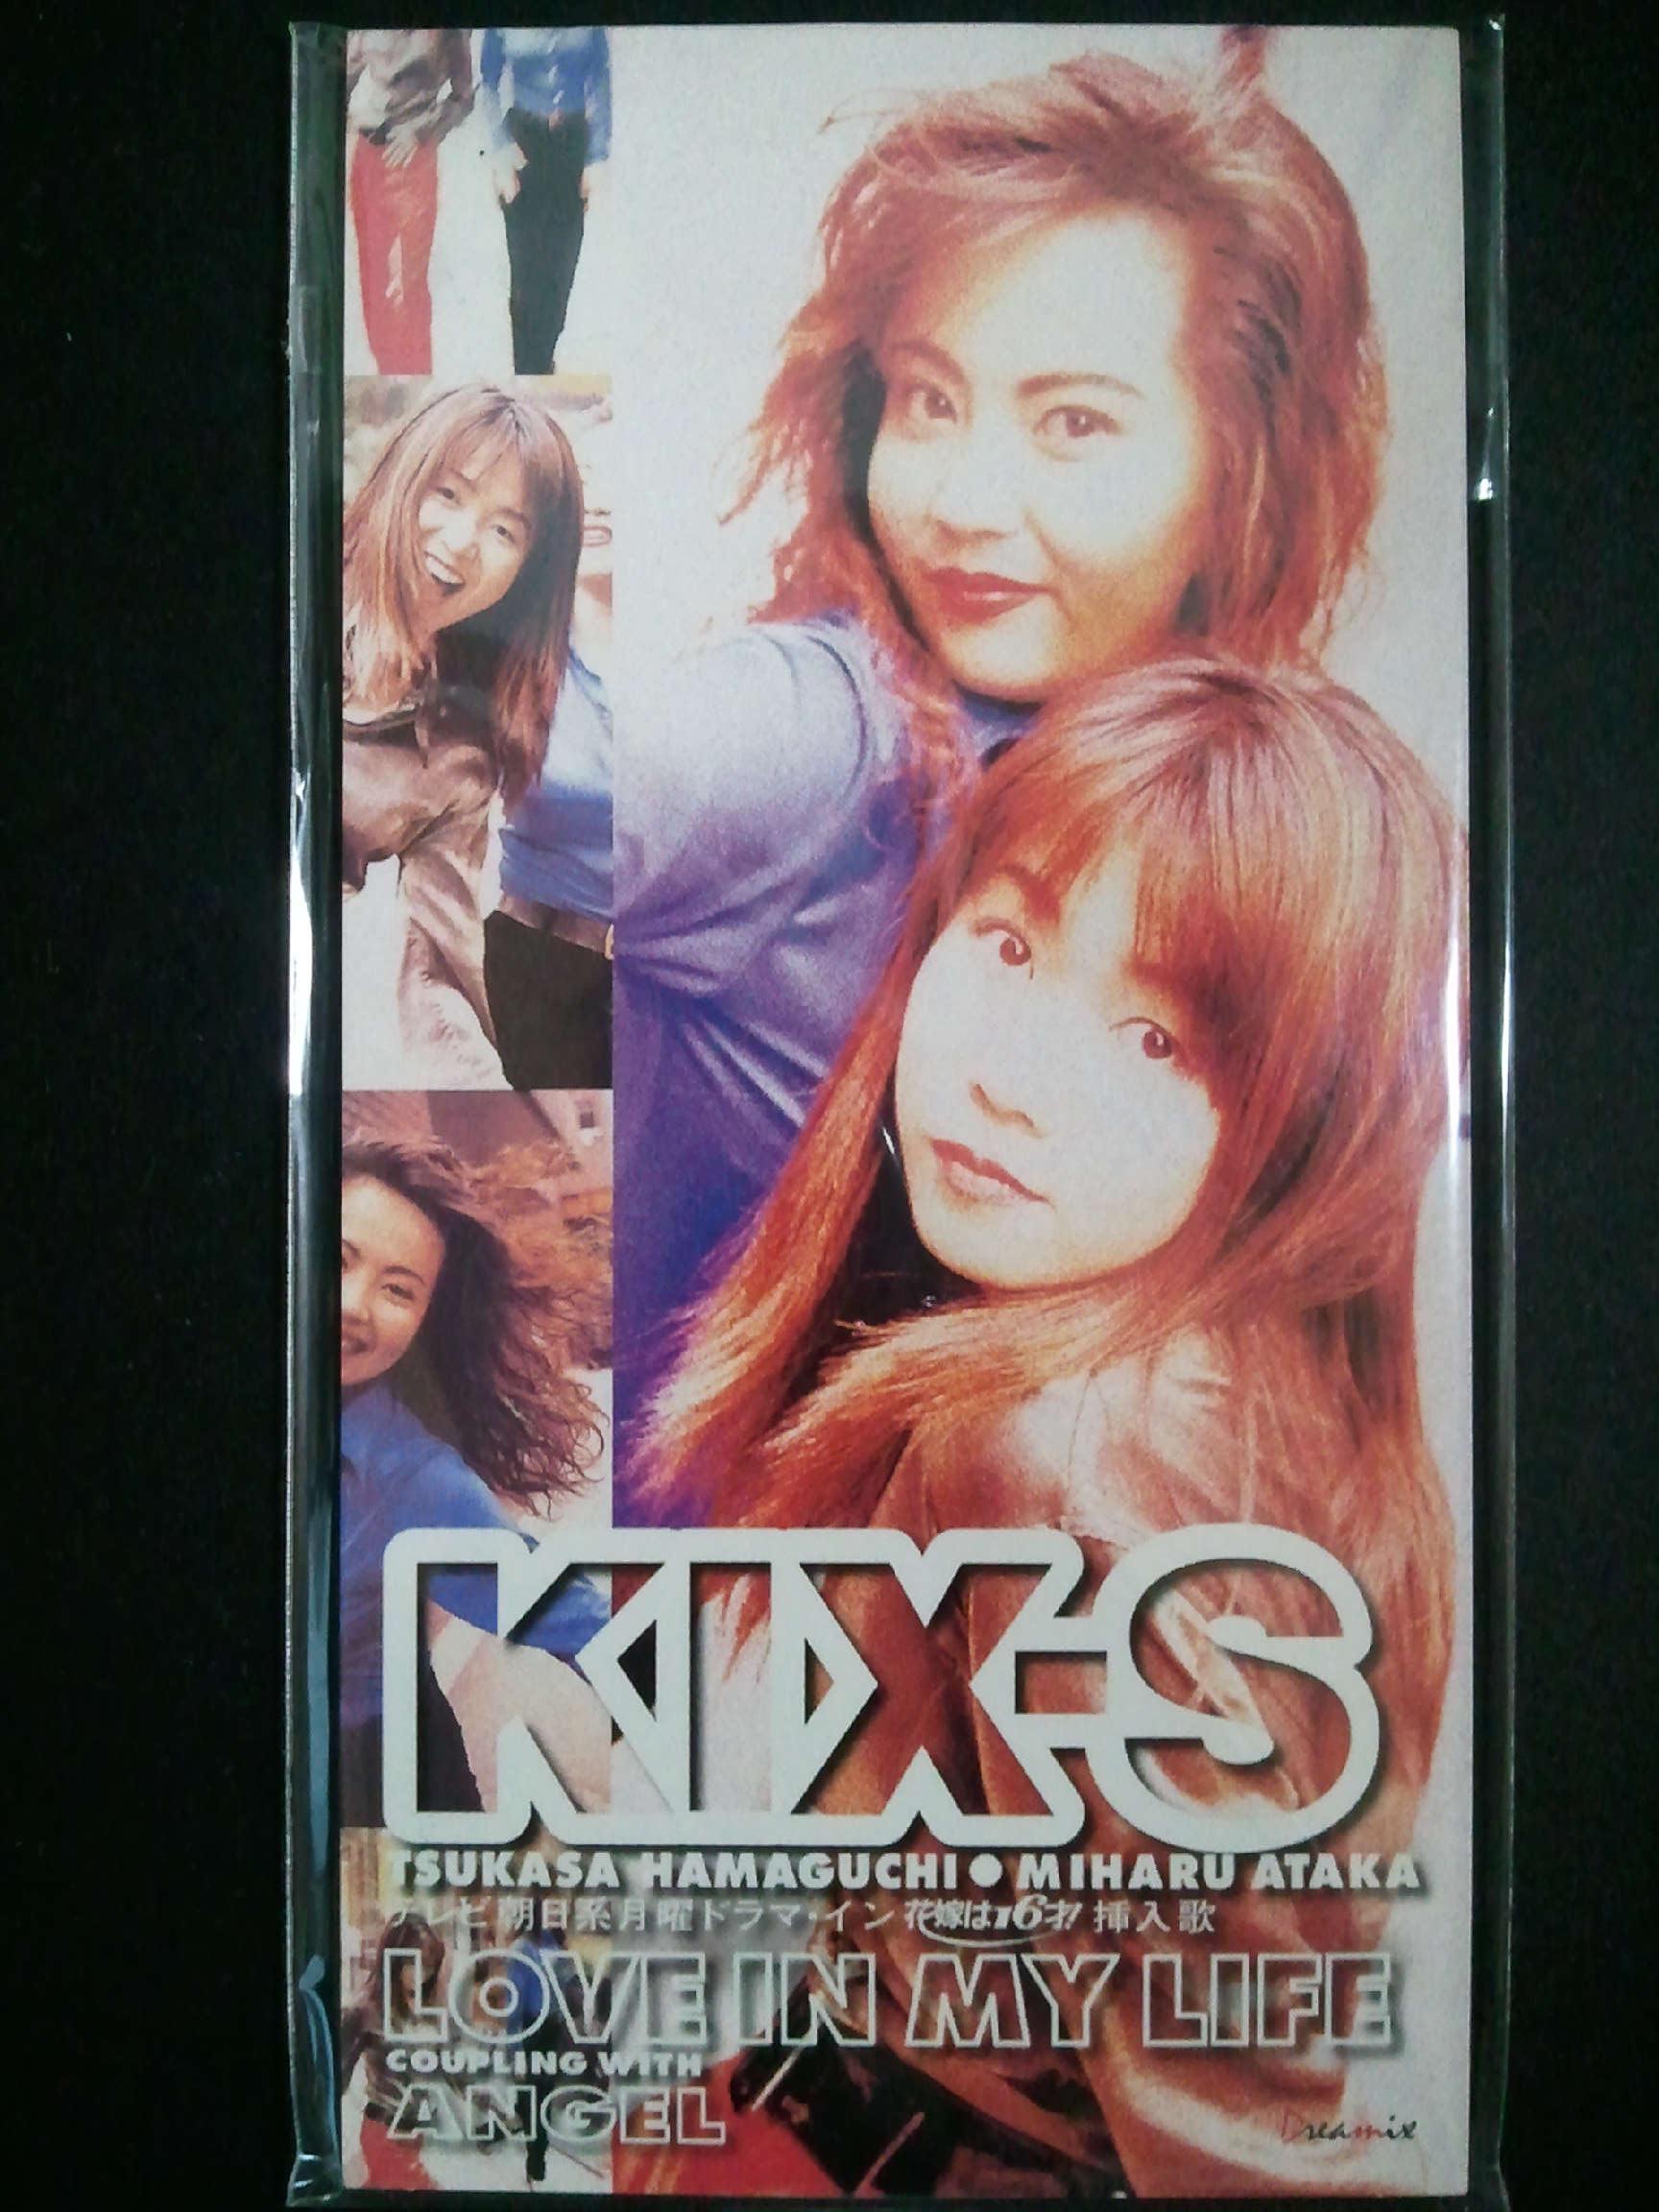 Kix・s Love in my life